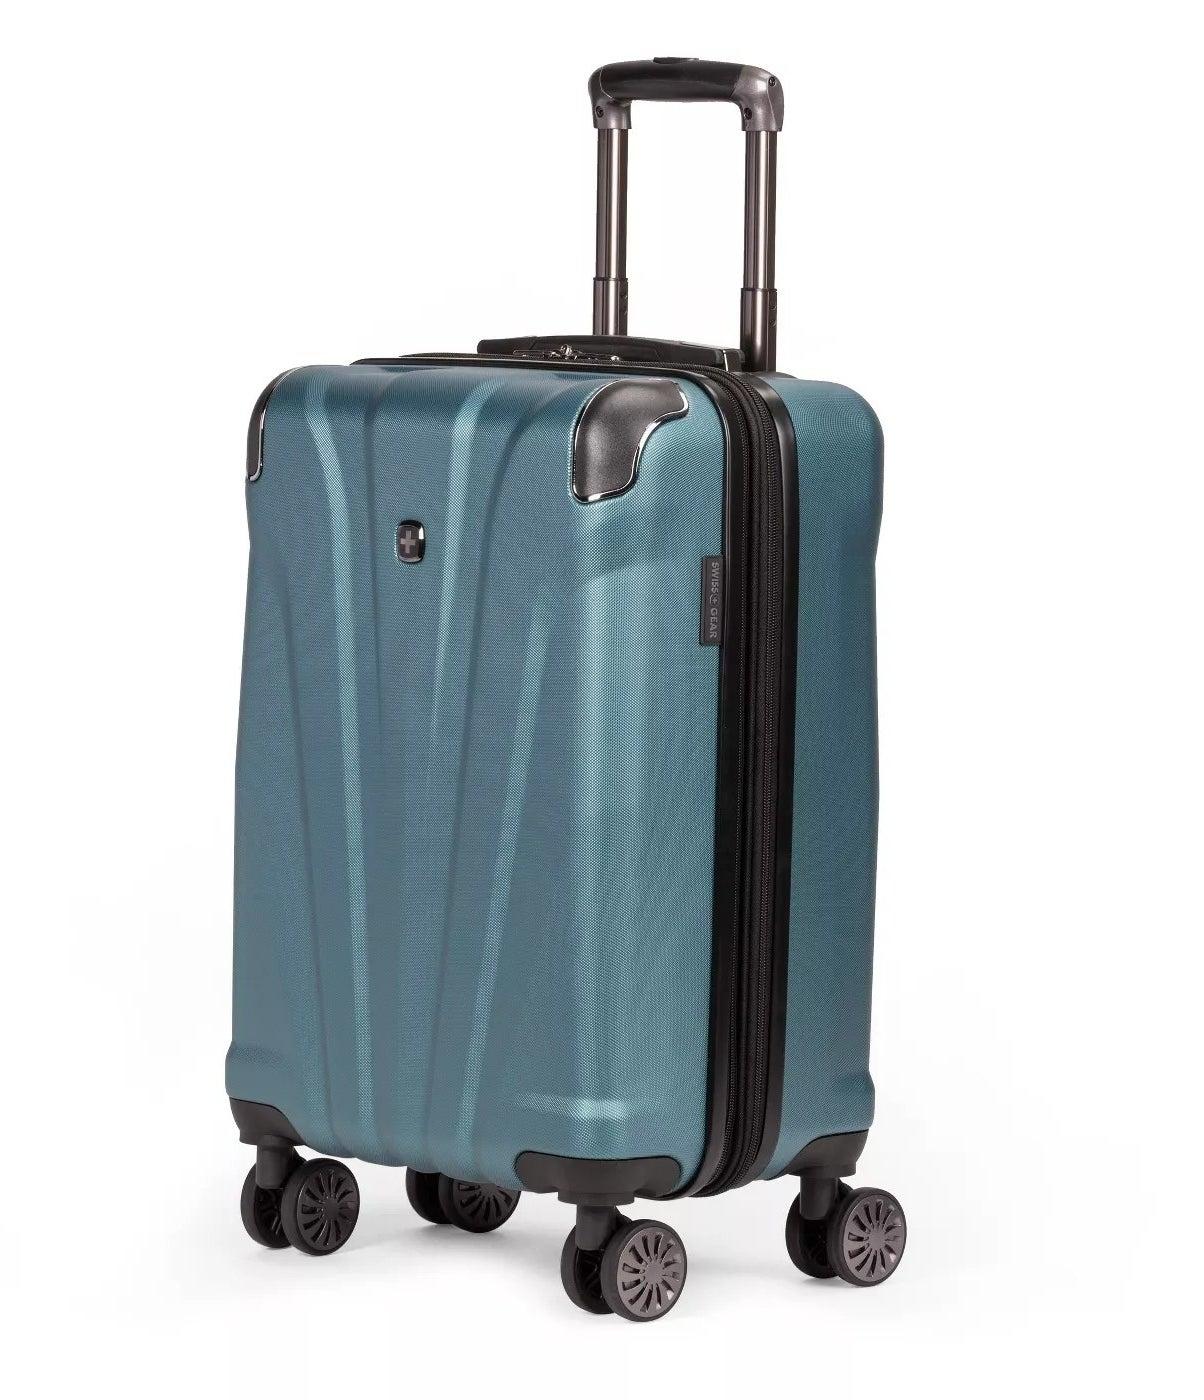 The blue Swissgear suitcase